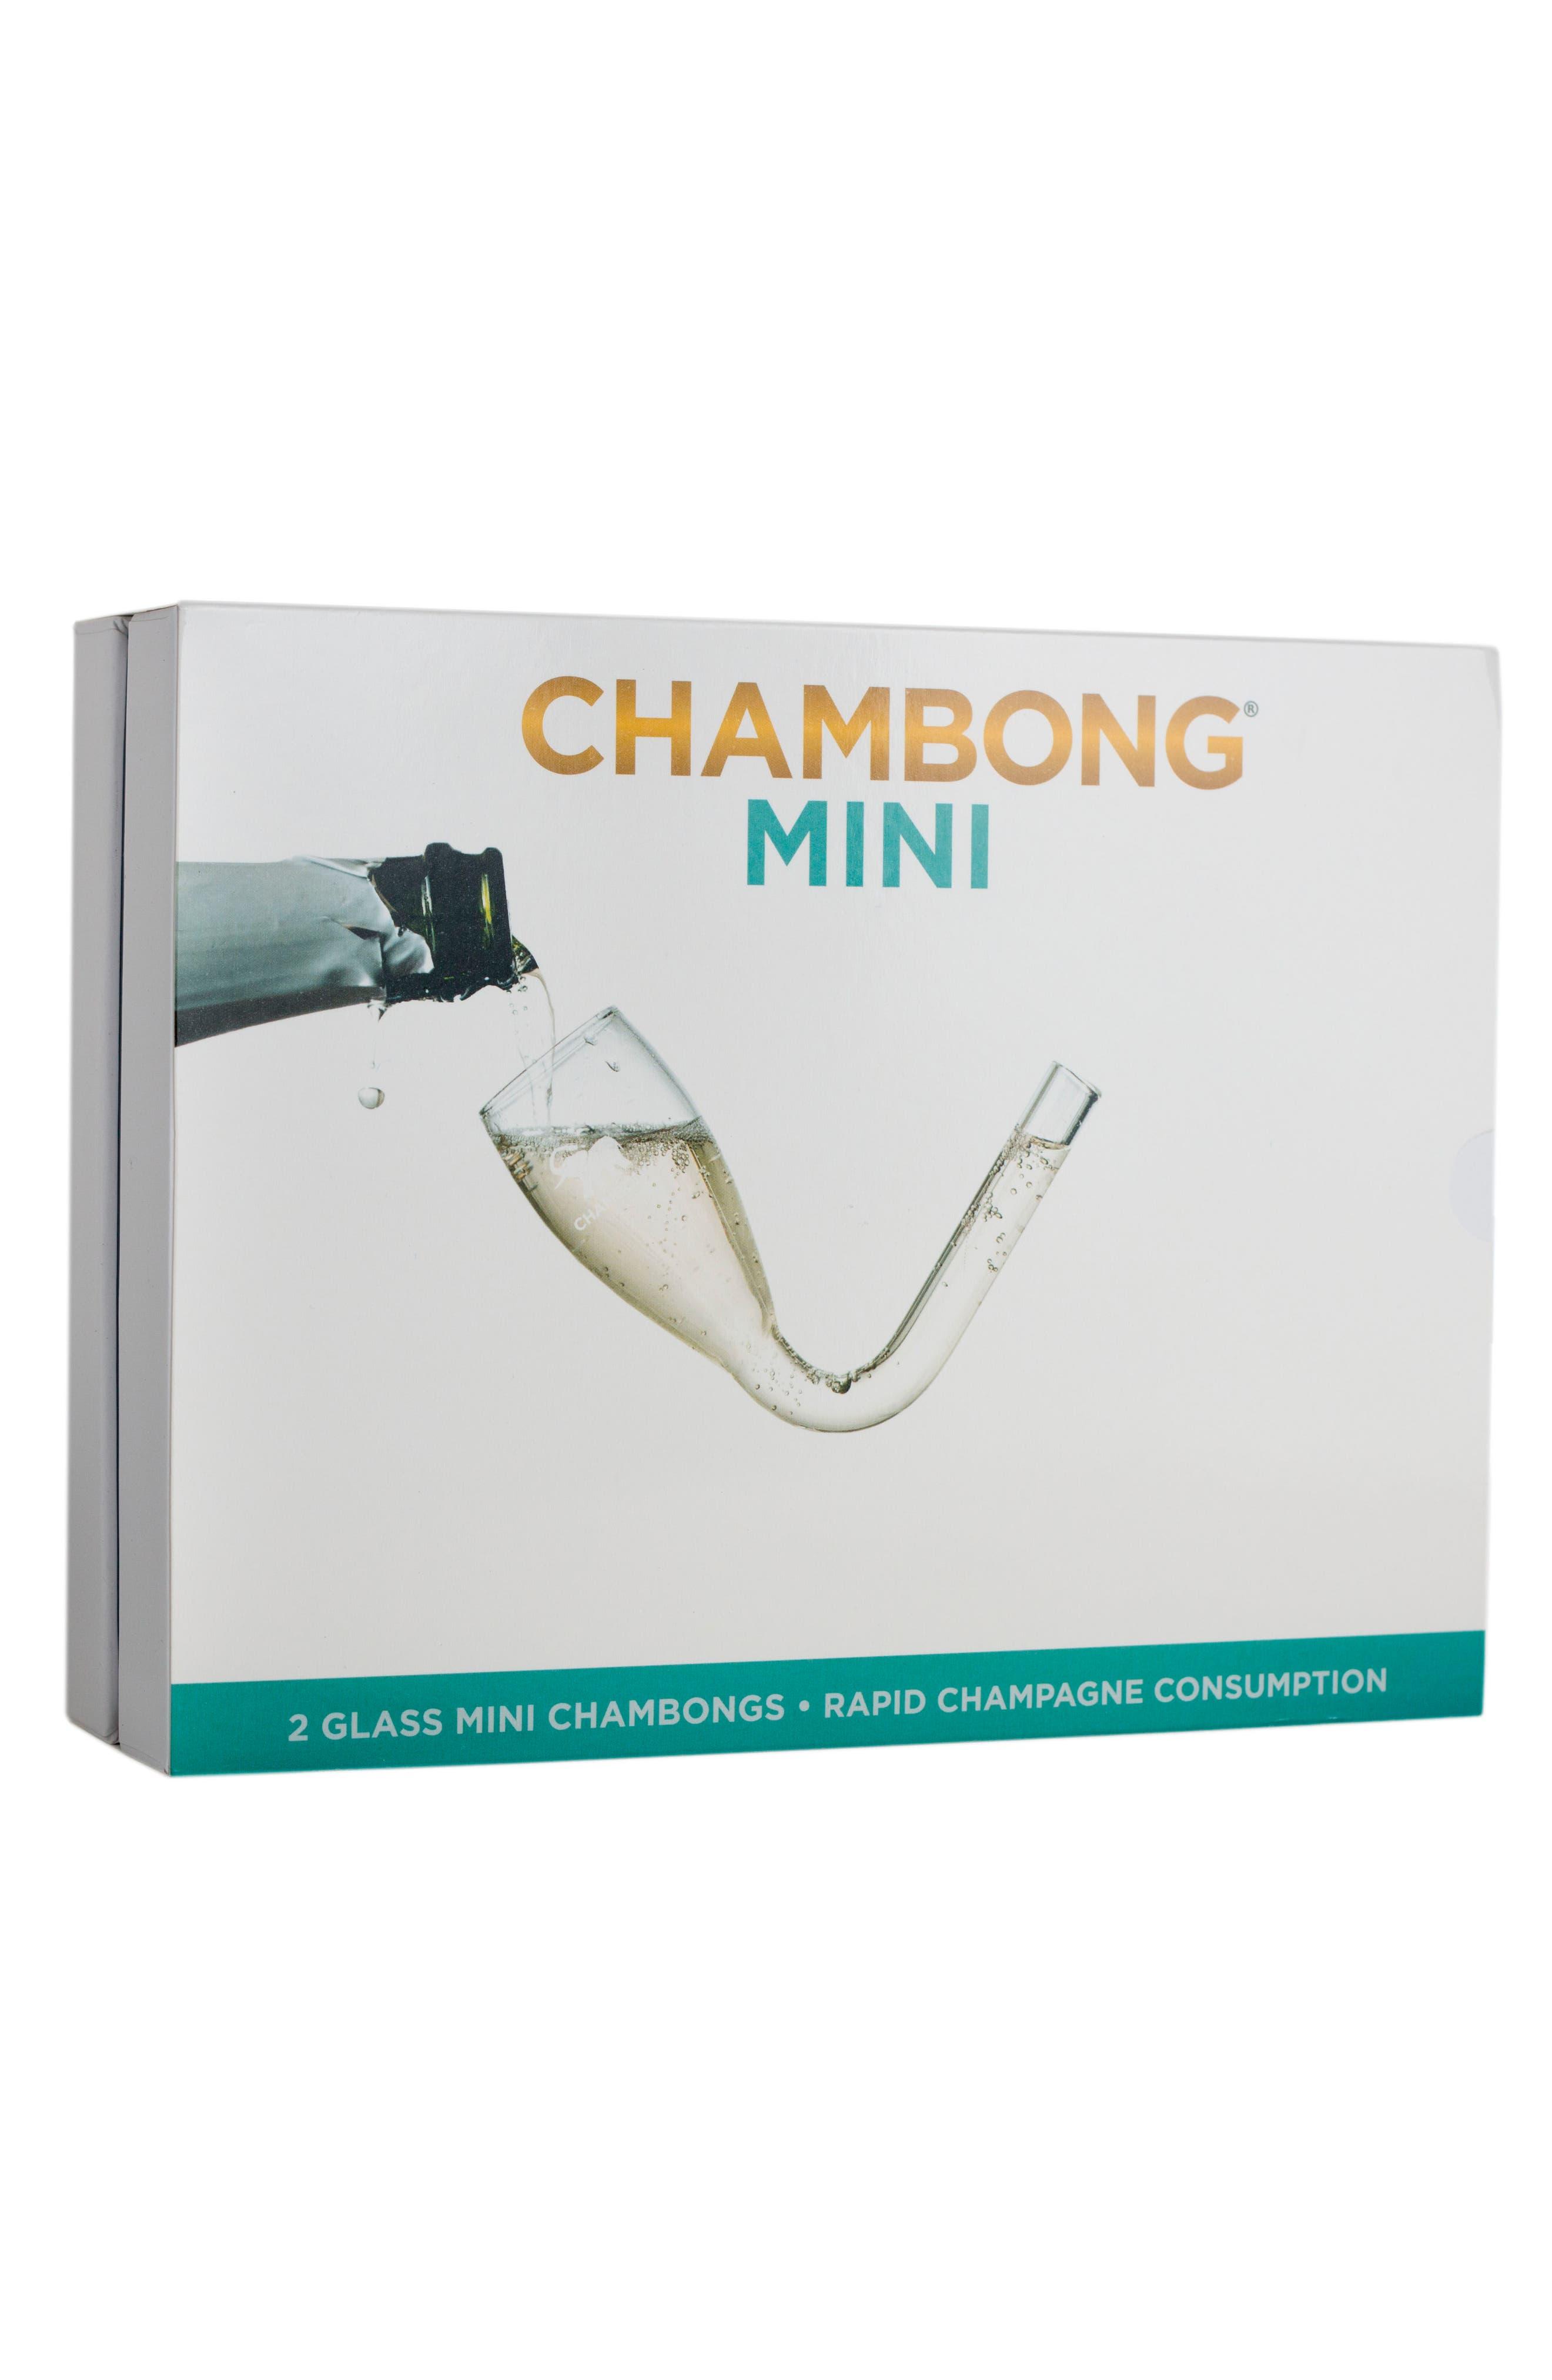 Chambong Set of 2 Mini Curved Champagne Glasses